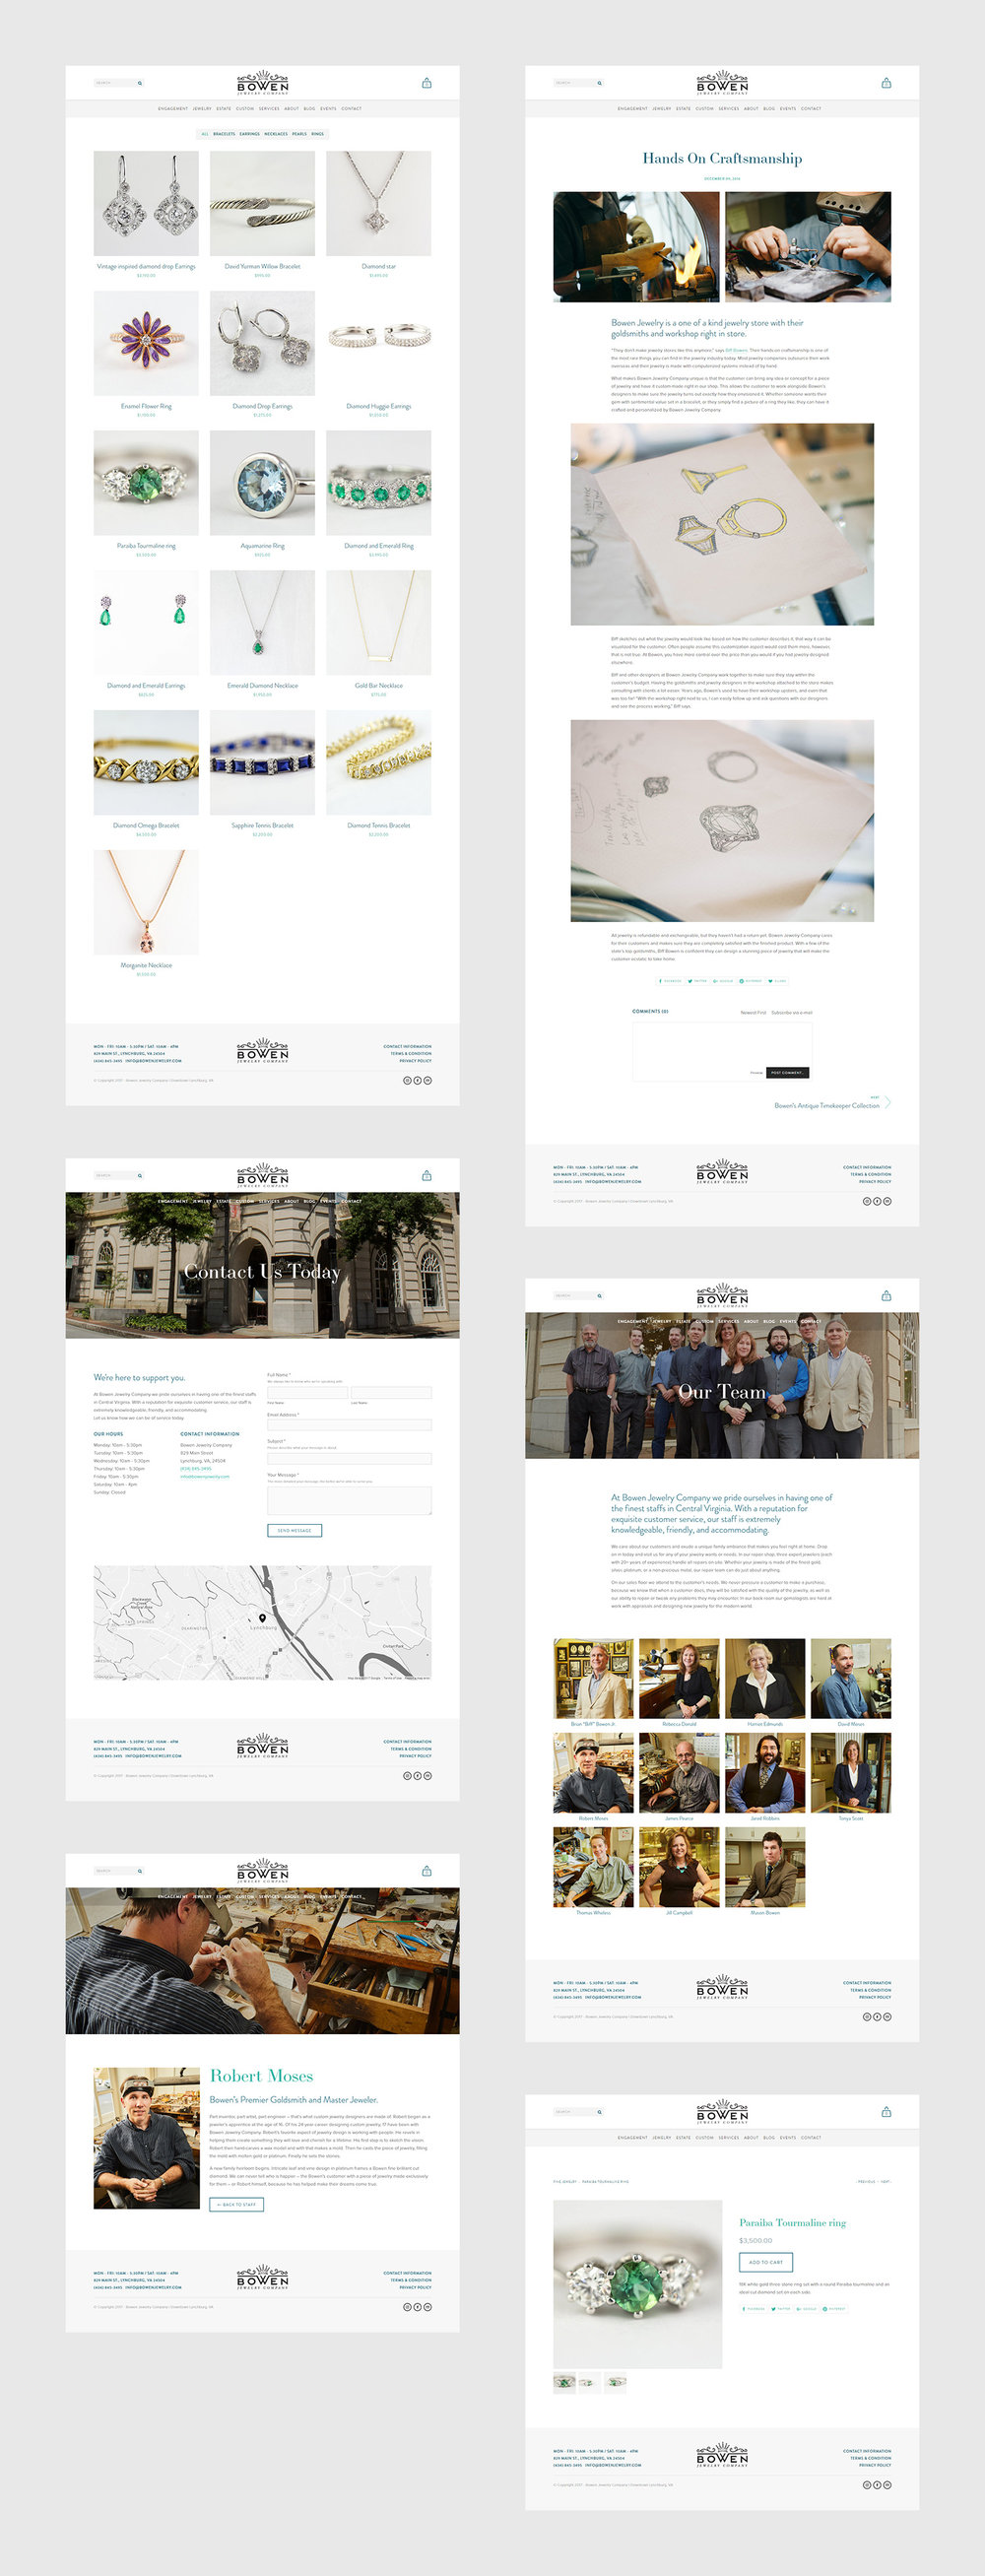 Squarespace-bowen-jewelry-shop-portfolio-2.jpg